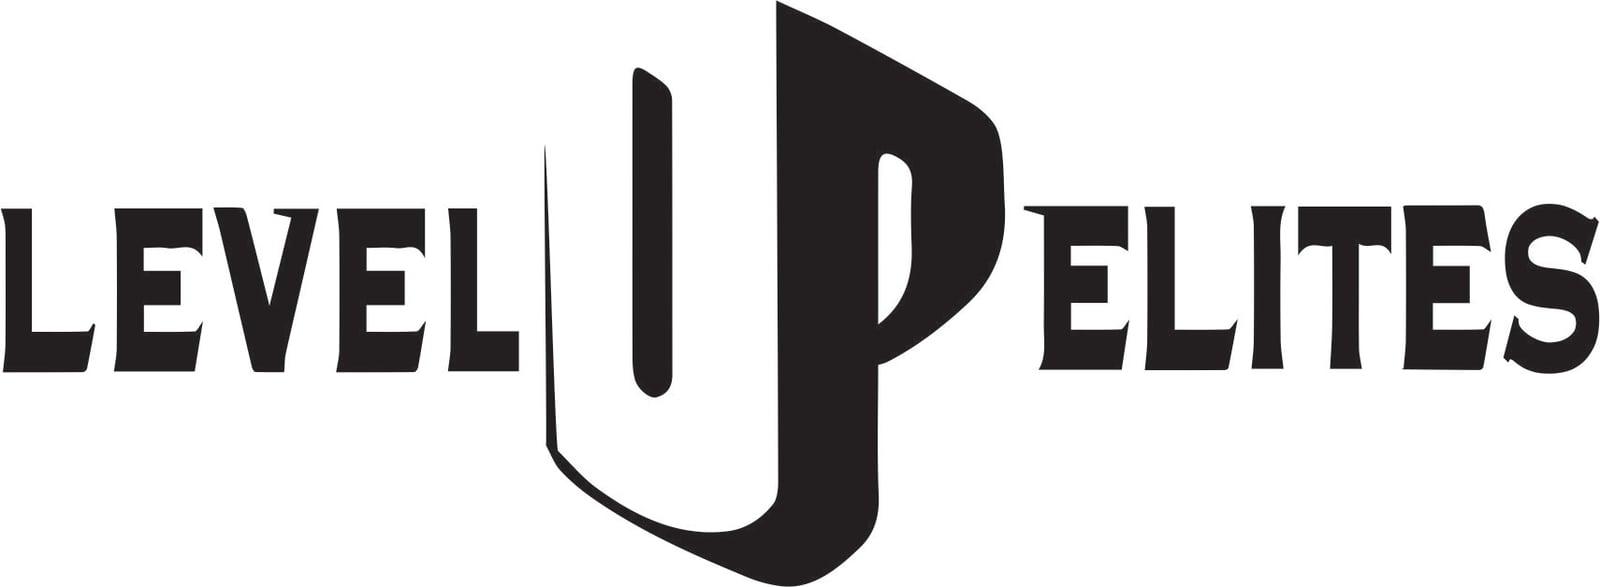 Level Up Elites's account image